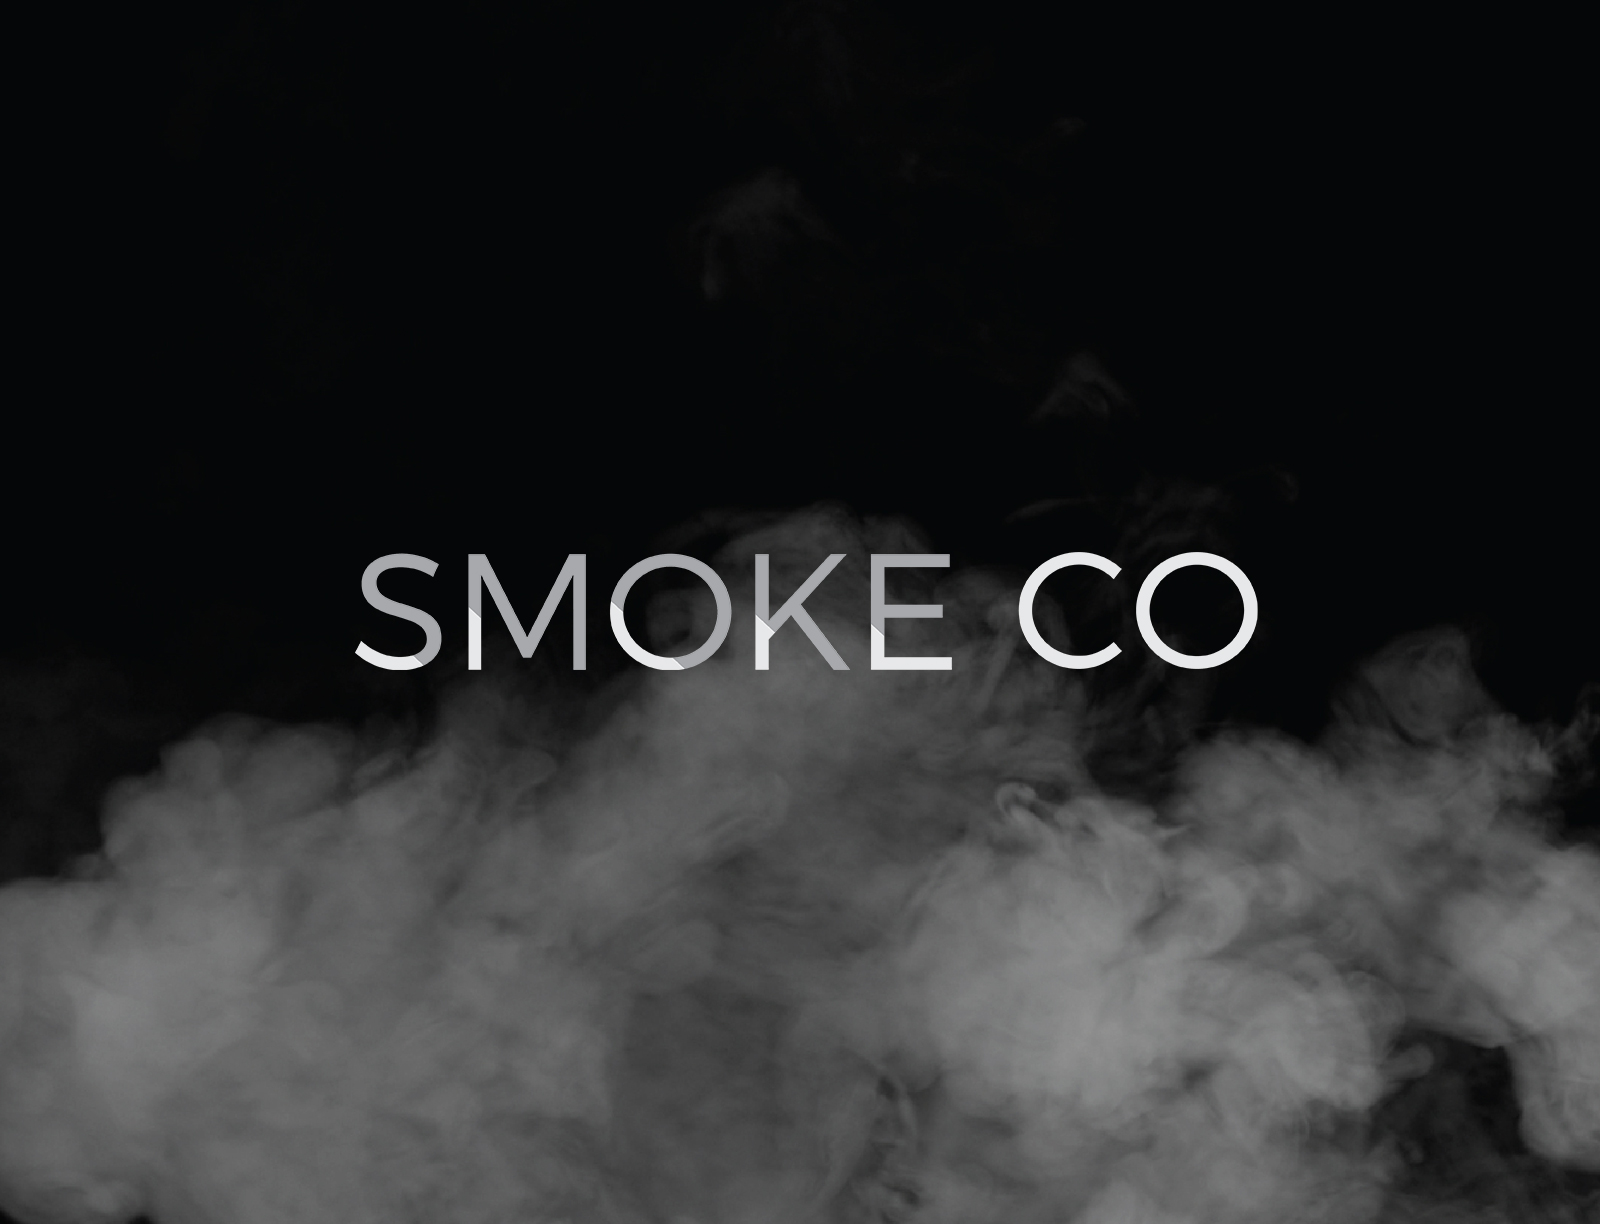 Tony White & Smoke Co